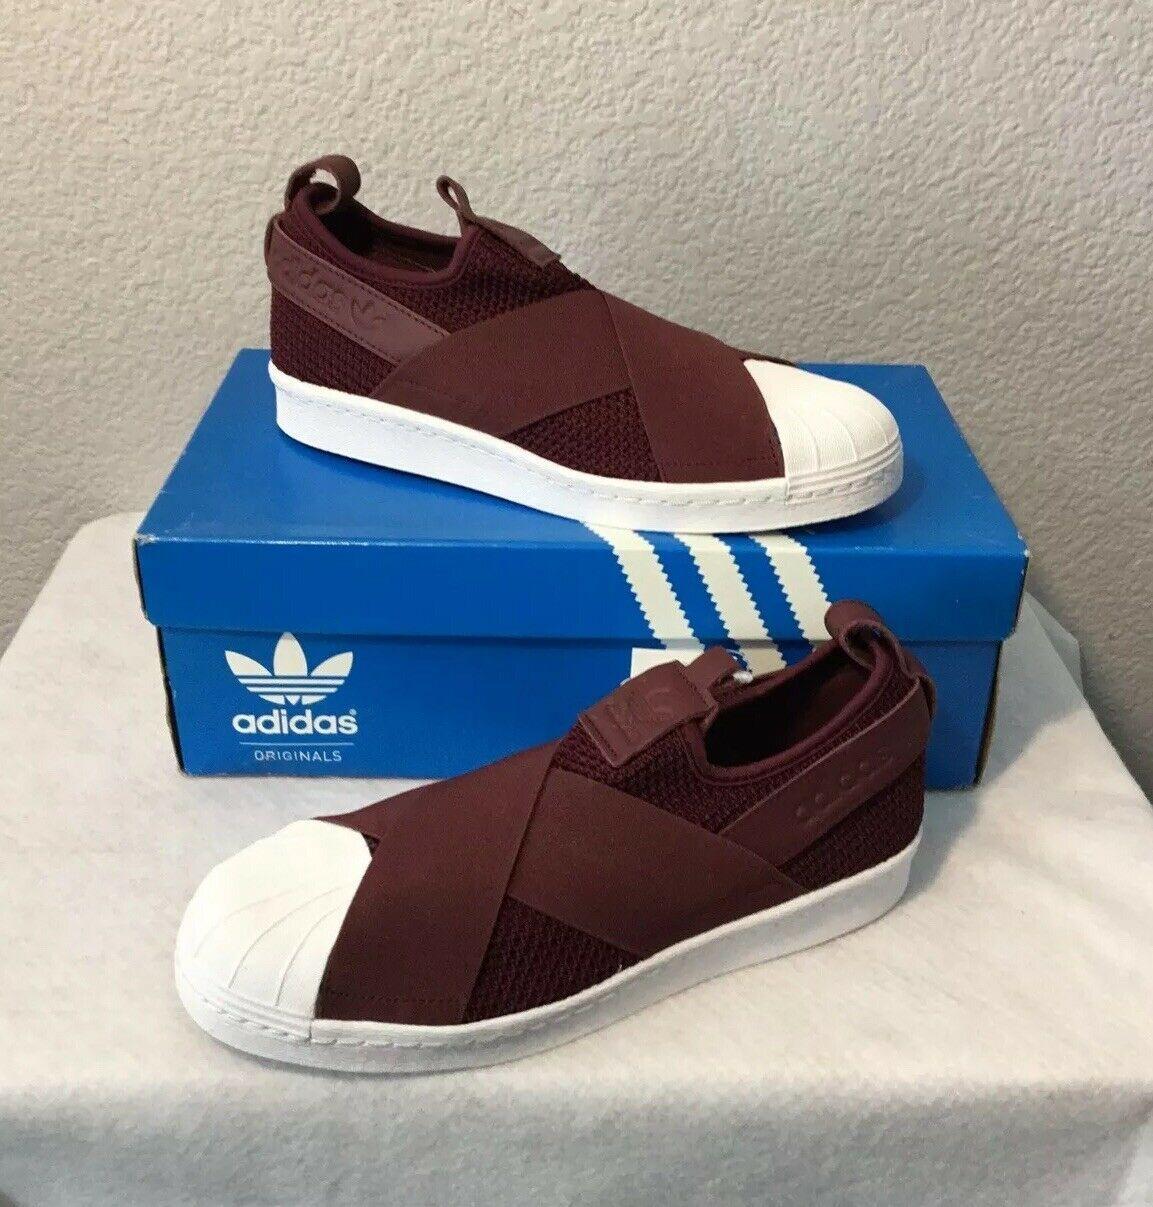 buy popular ea20b 3a186 New Adidas Originals Superstar Slip On Shoes and 20 similar ...